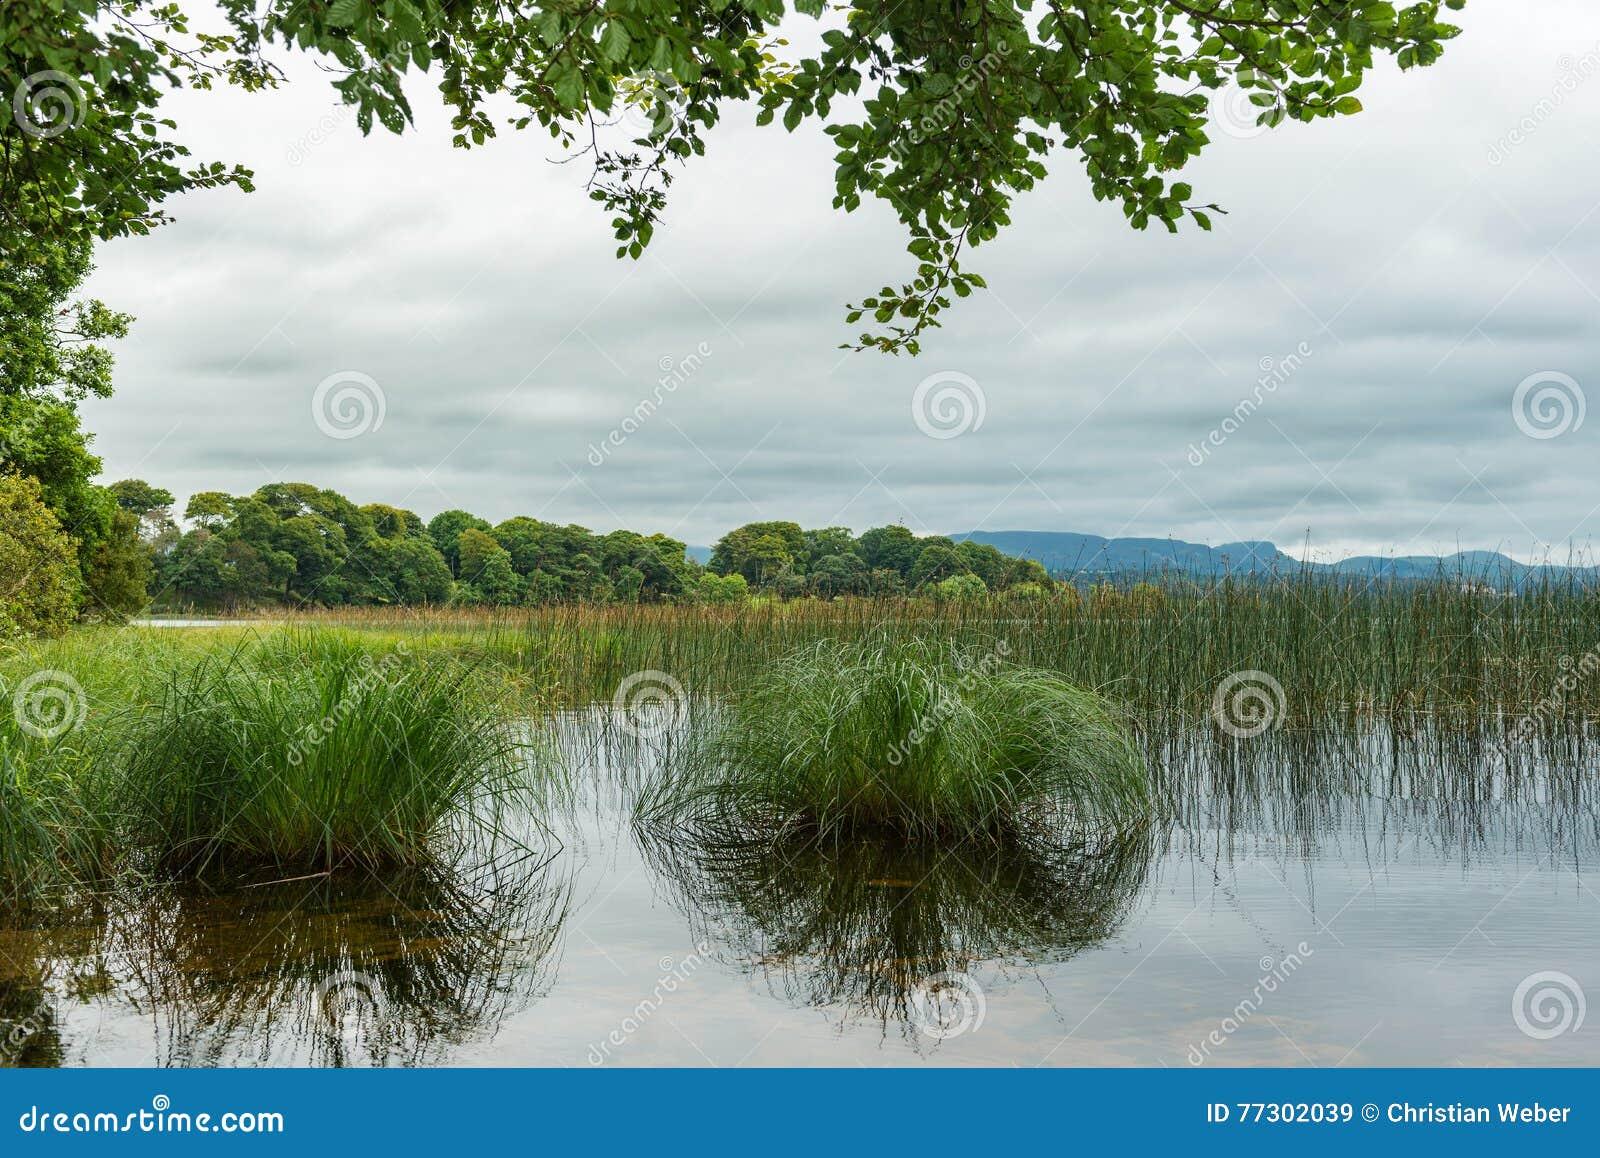 Closeup view of an irish lake